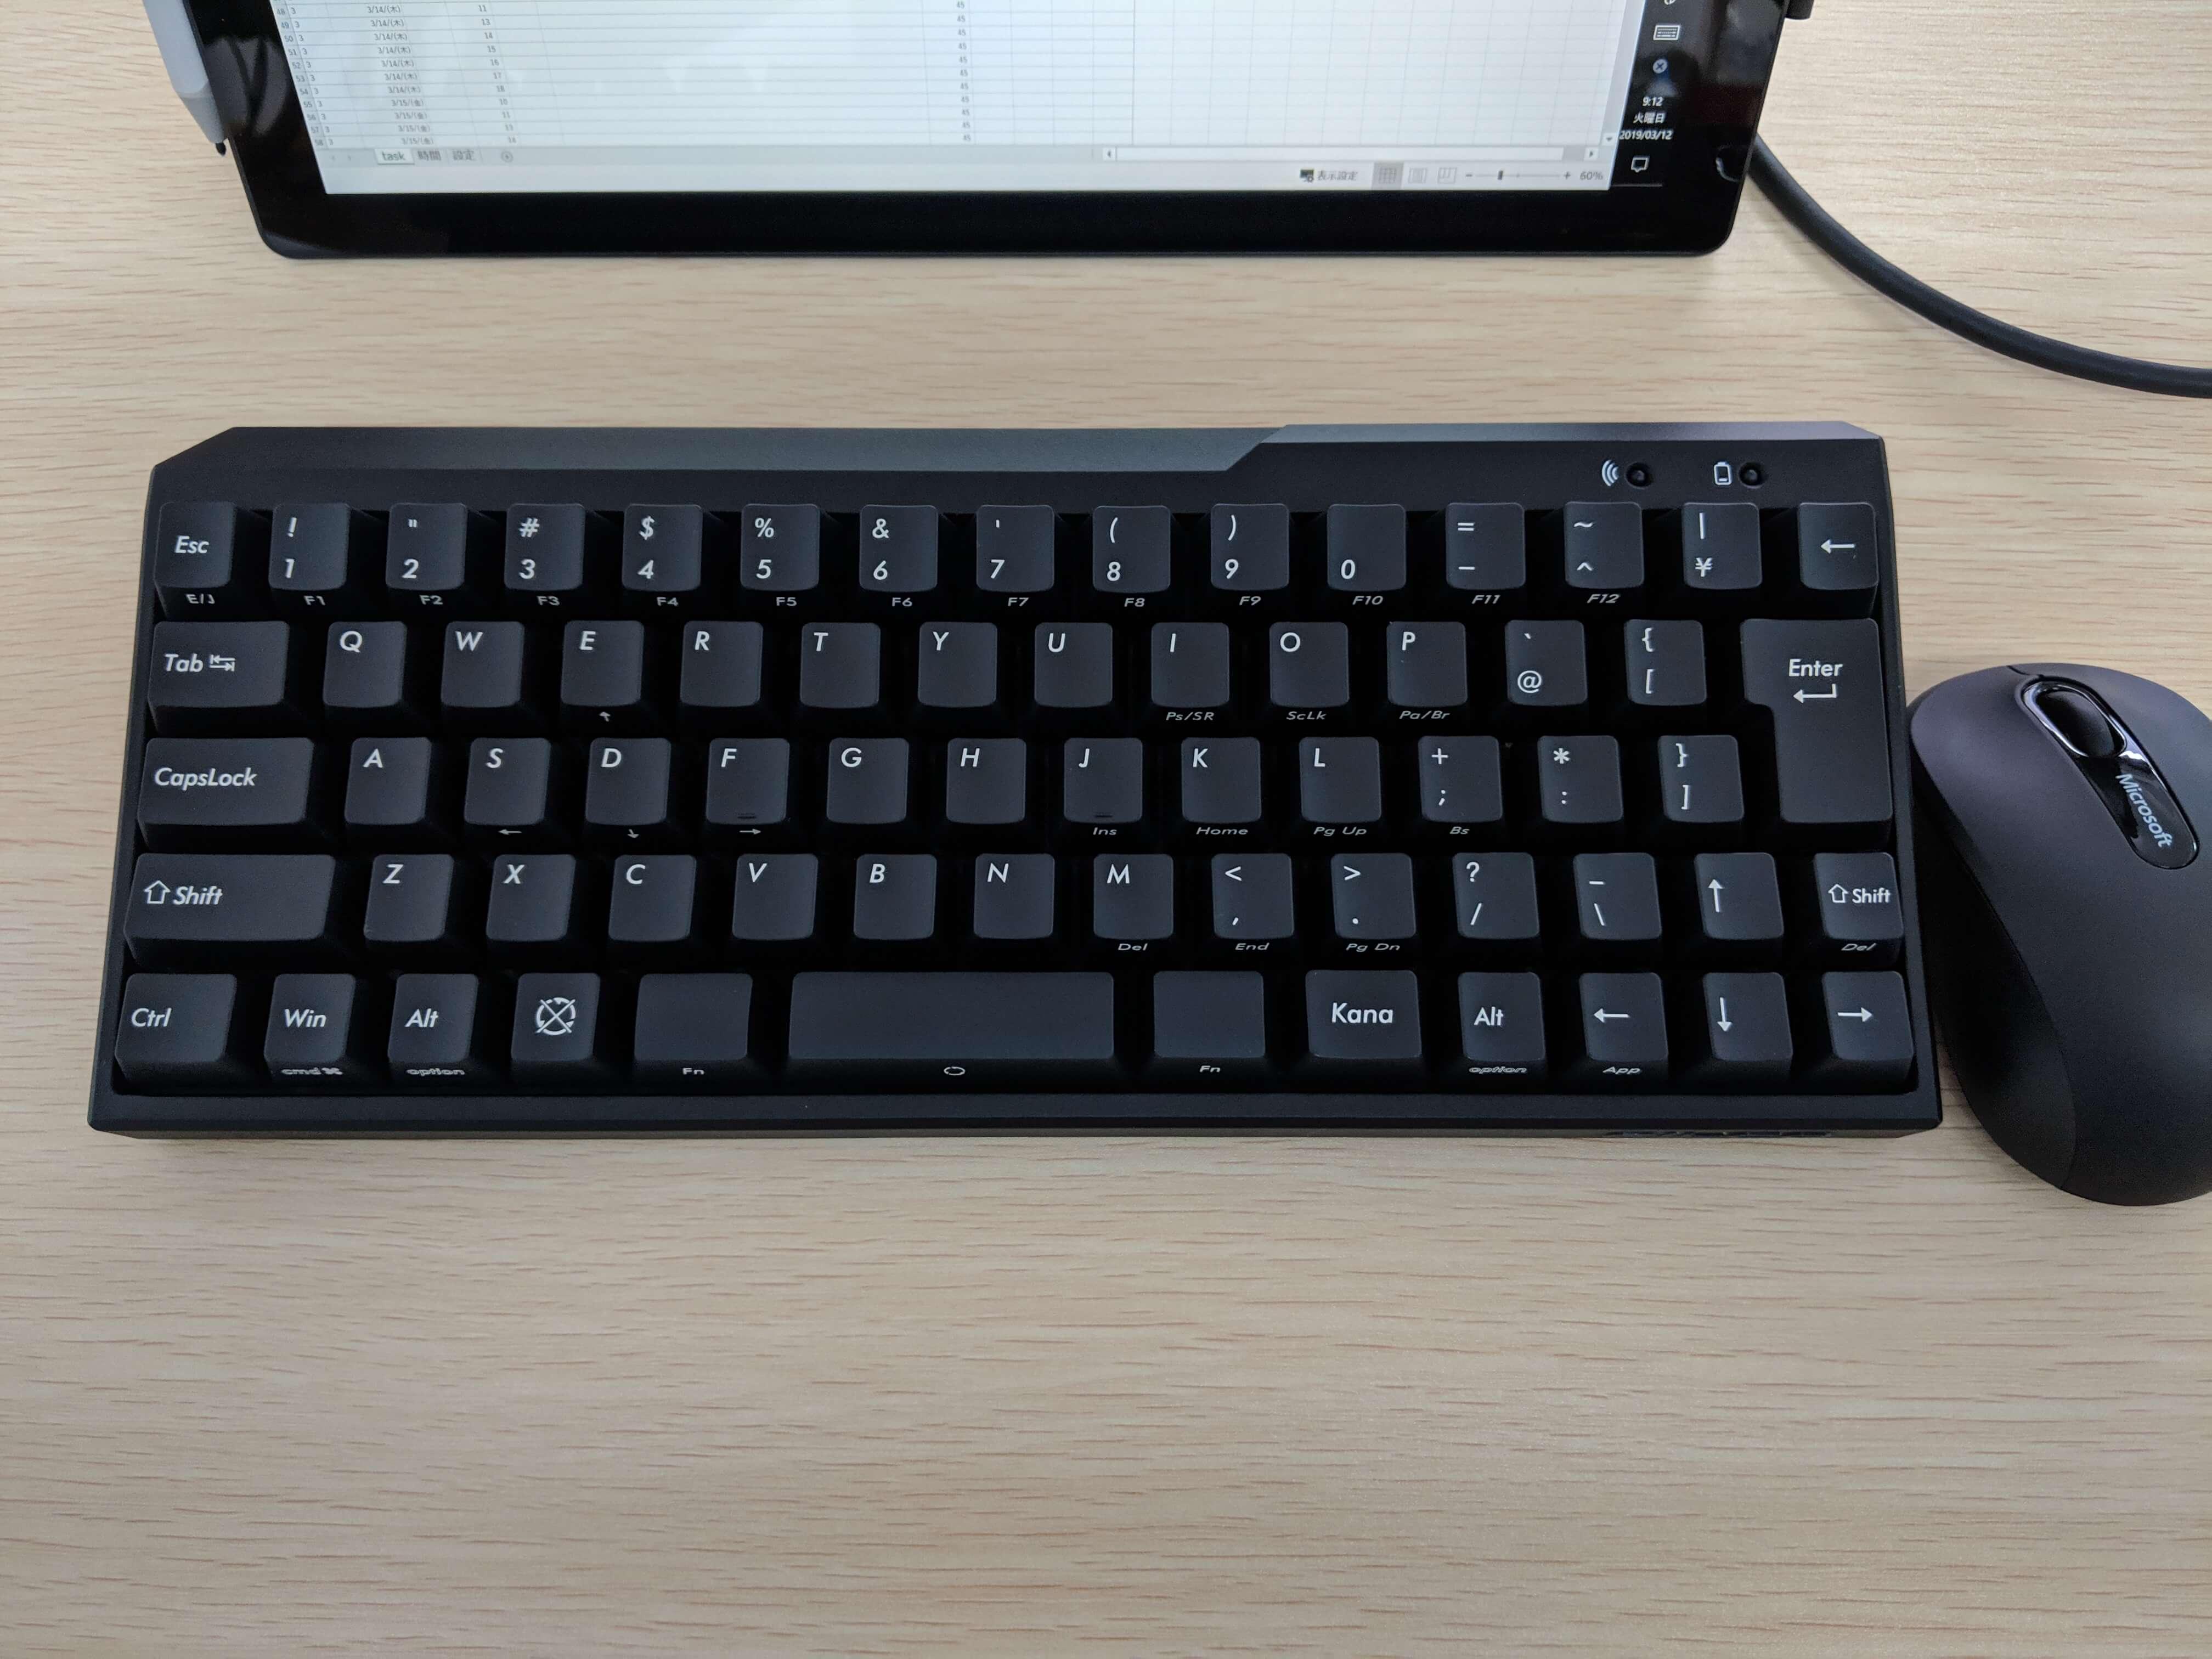 Bluetoothキーボードのチャタリング問題